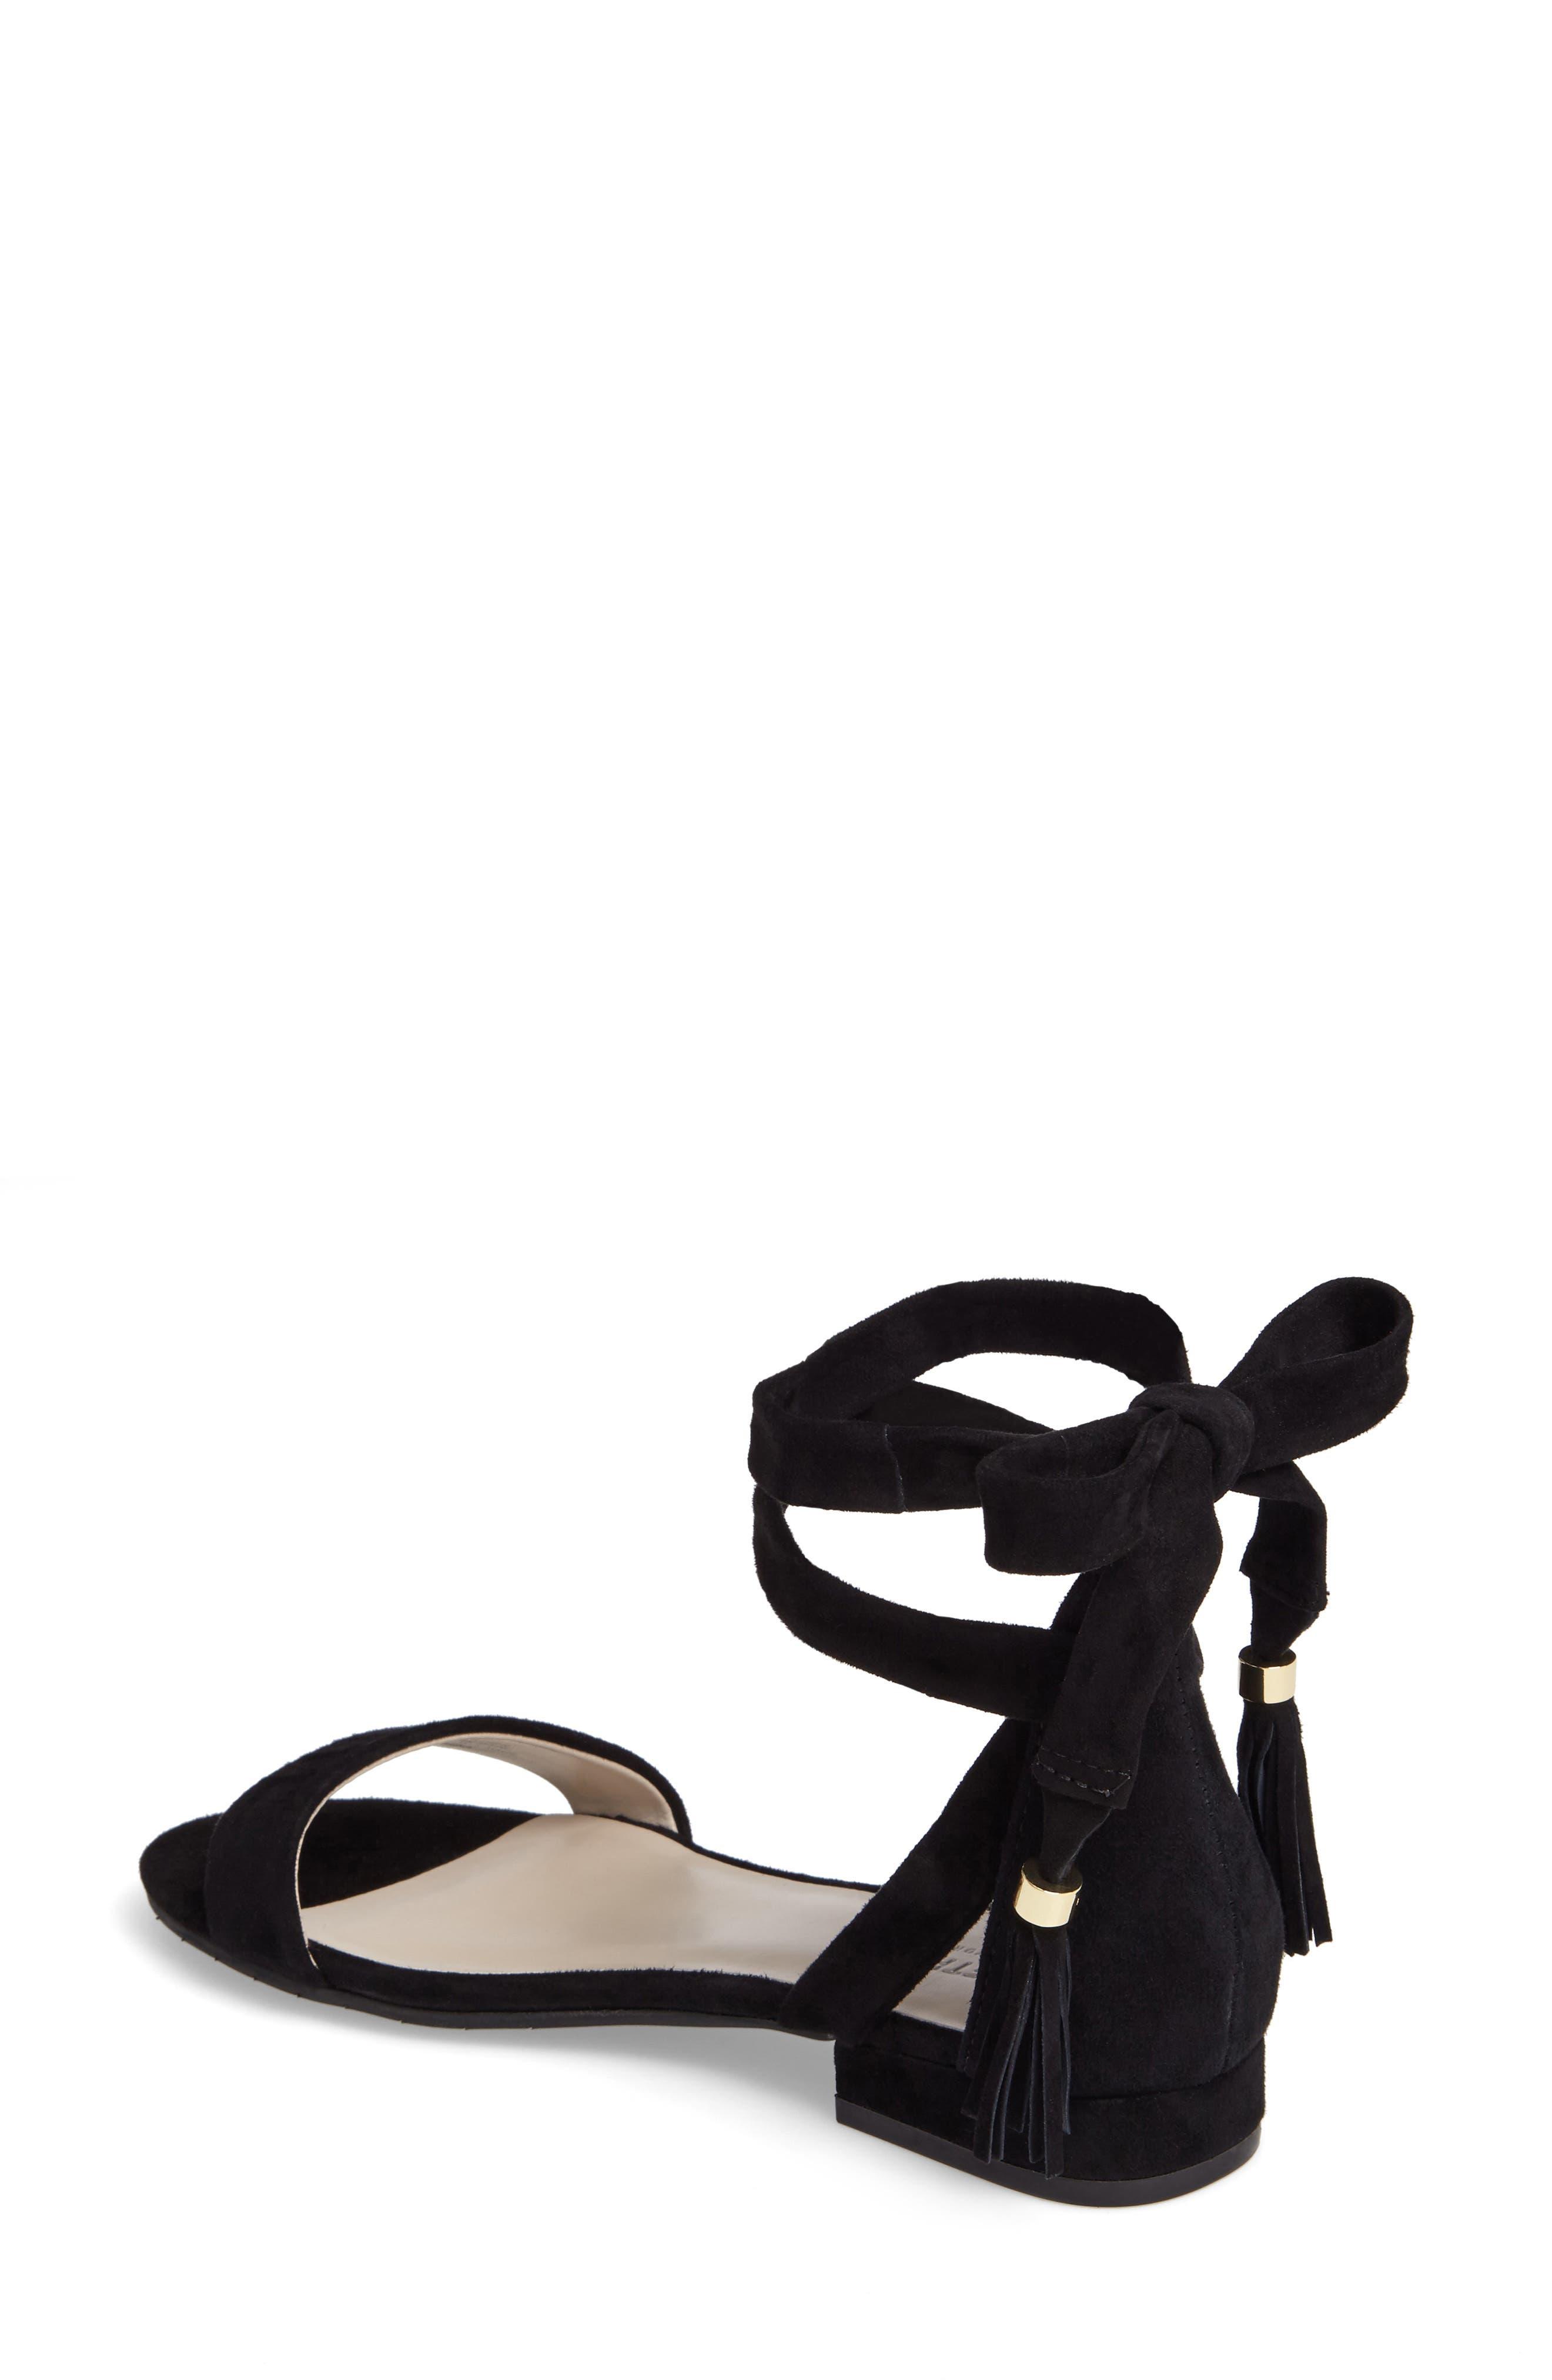 Valen Tassel Lace-Up Sandal,                             Alternate thumbnail 2, color,                             Black Suede